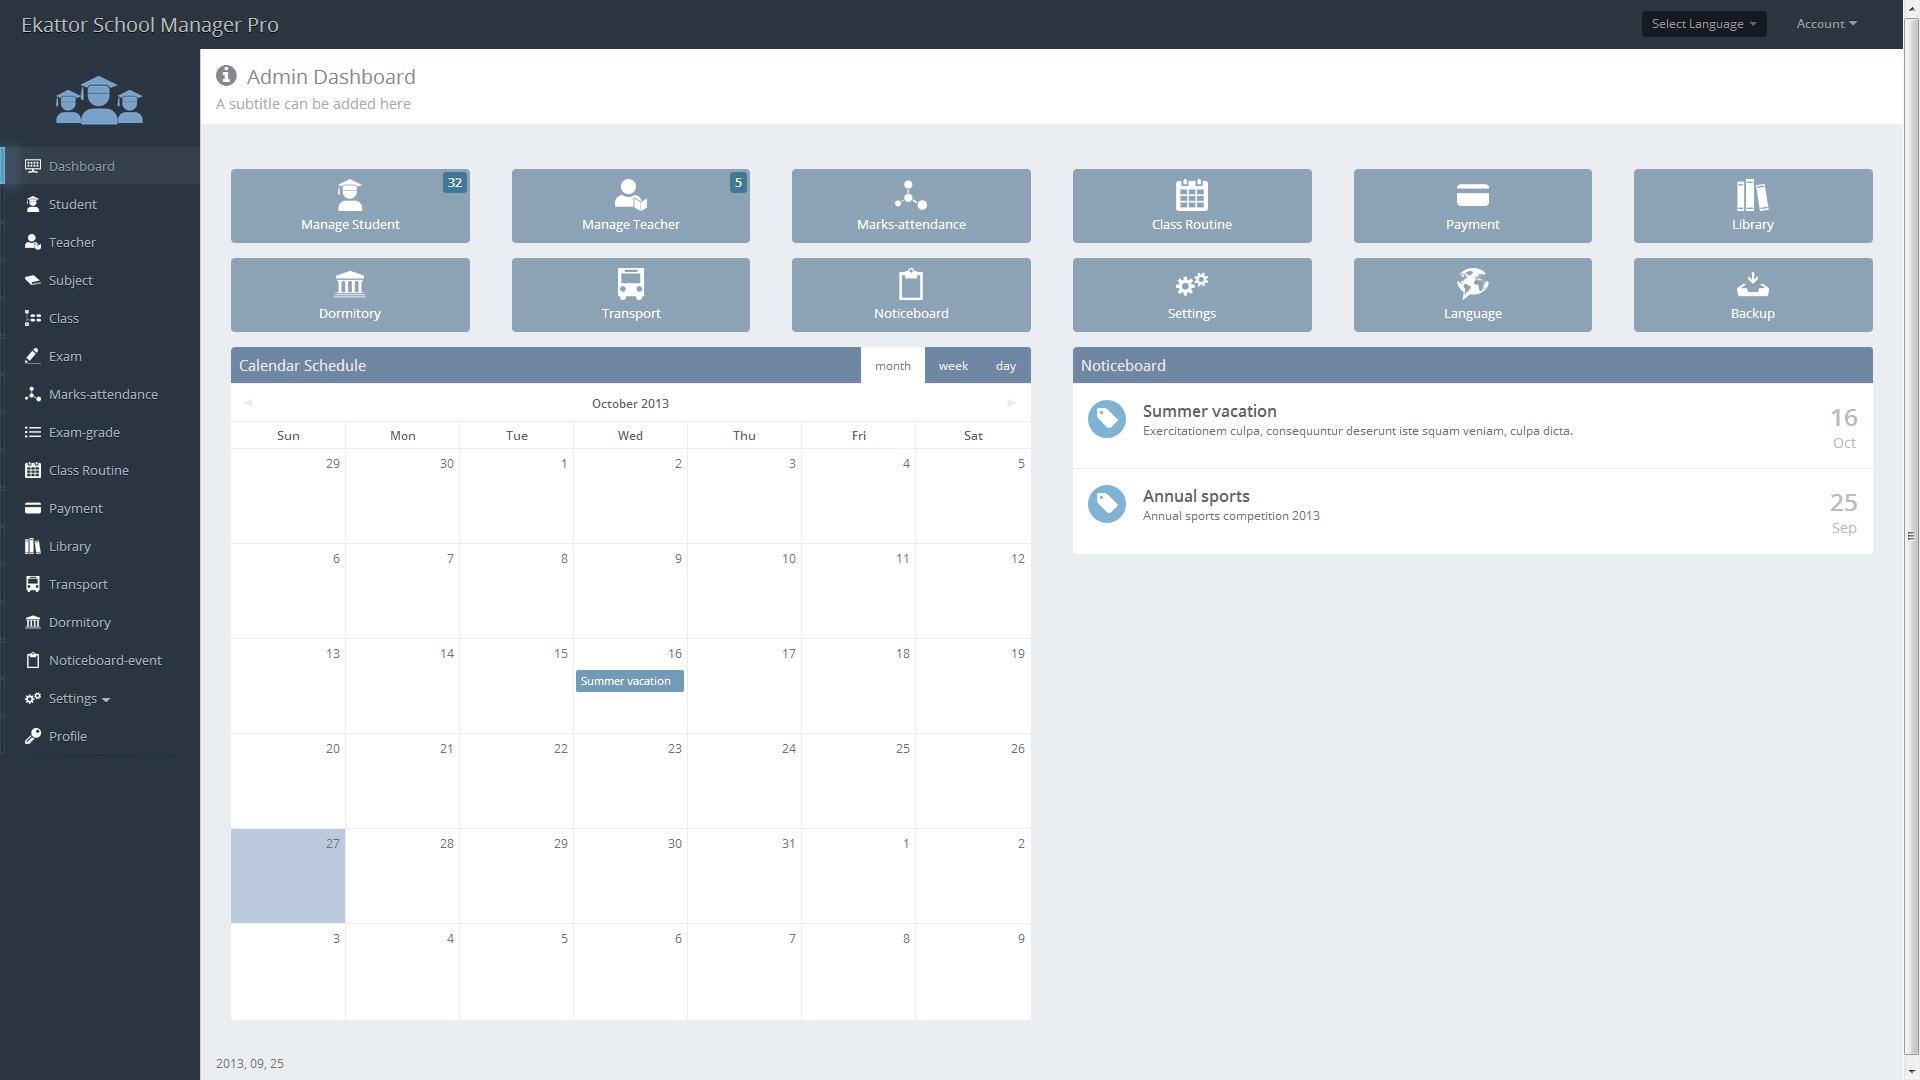 Ekattor School Management System Pro 3.0 | [Infoclub.PRO]